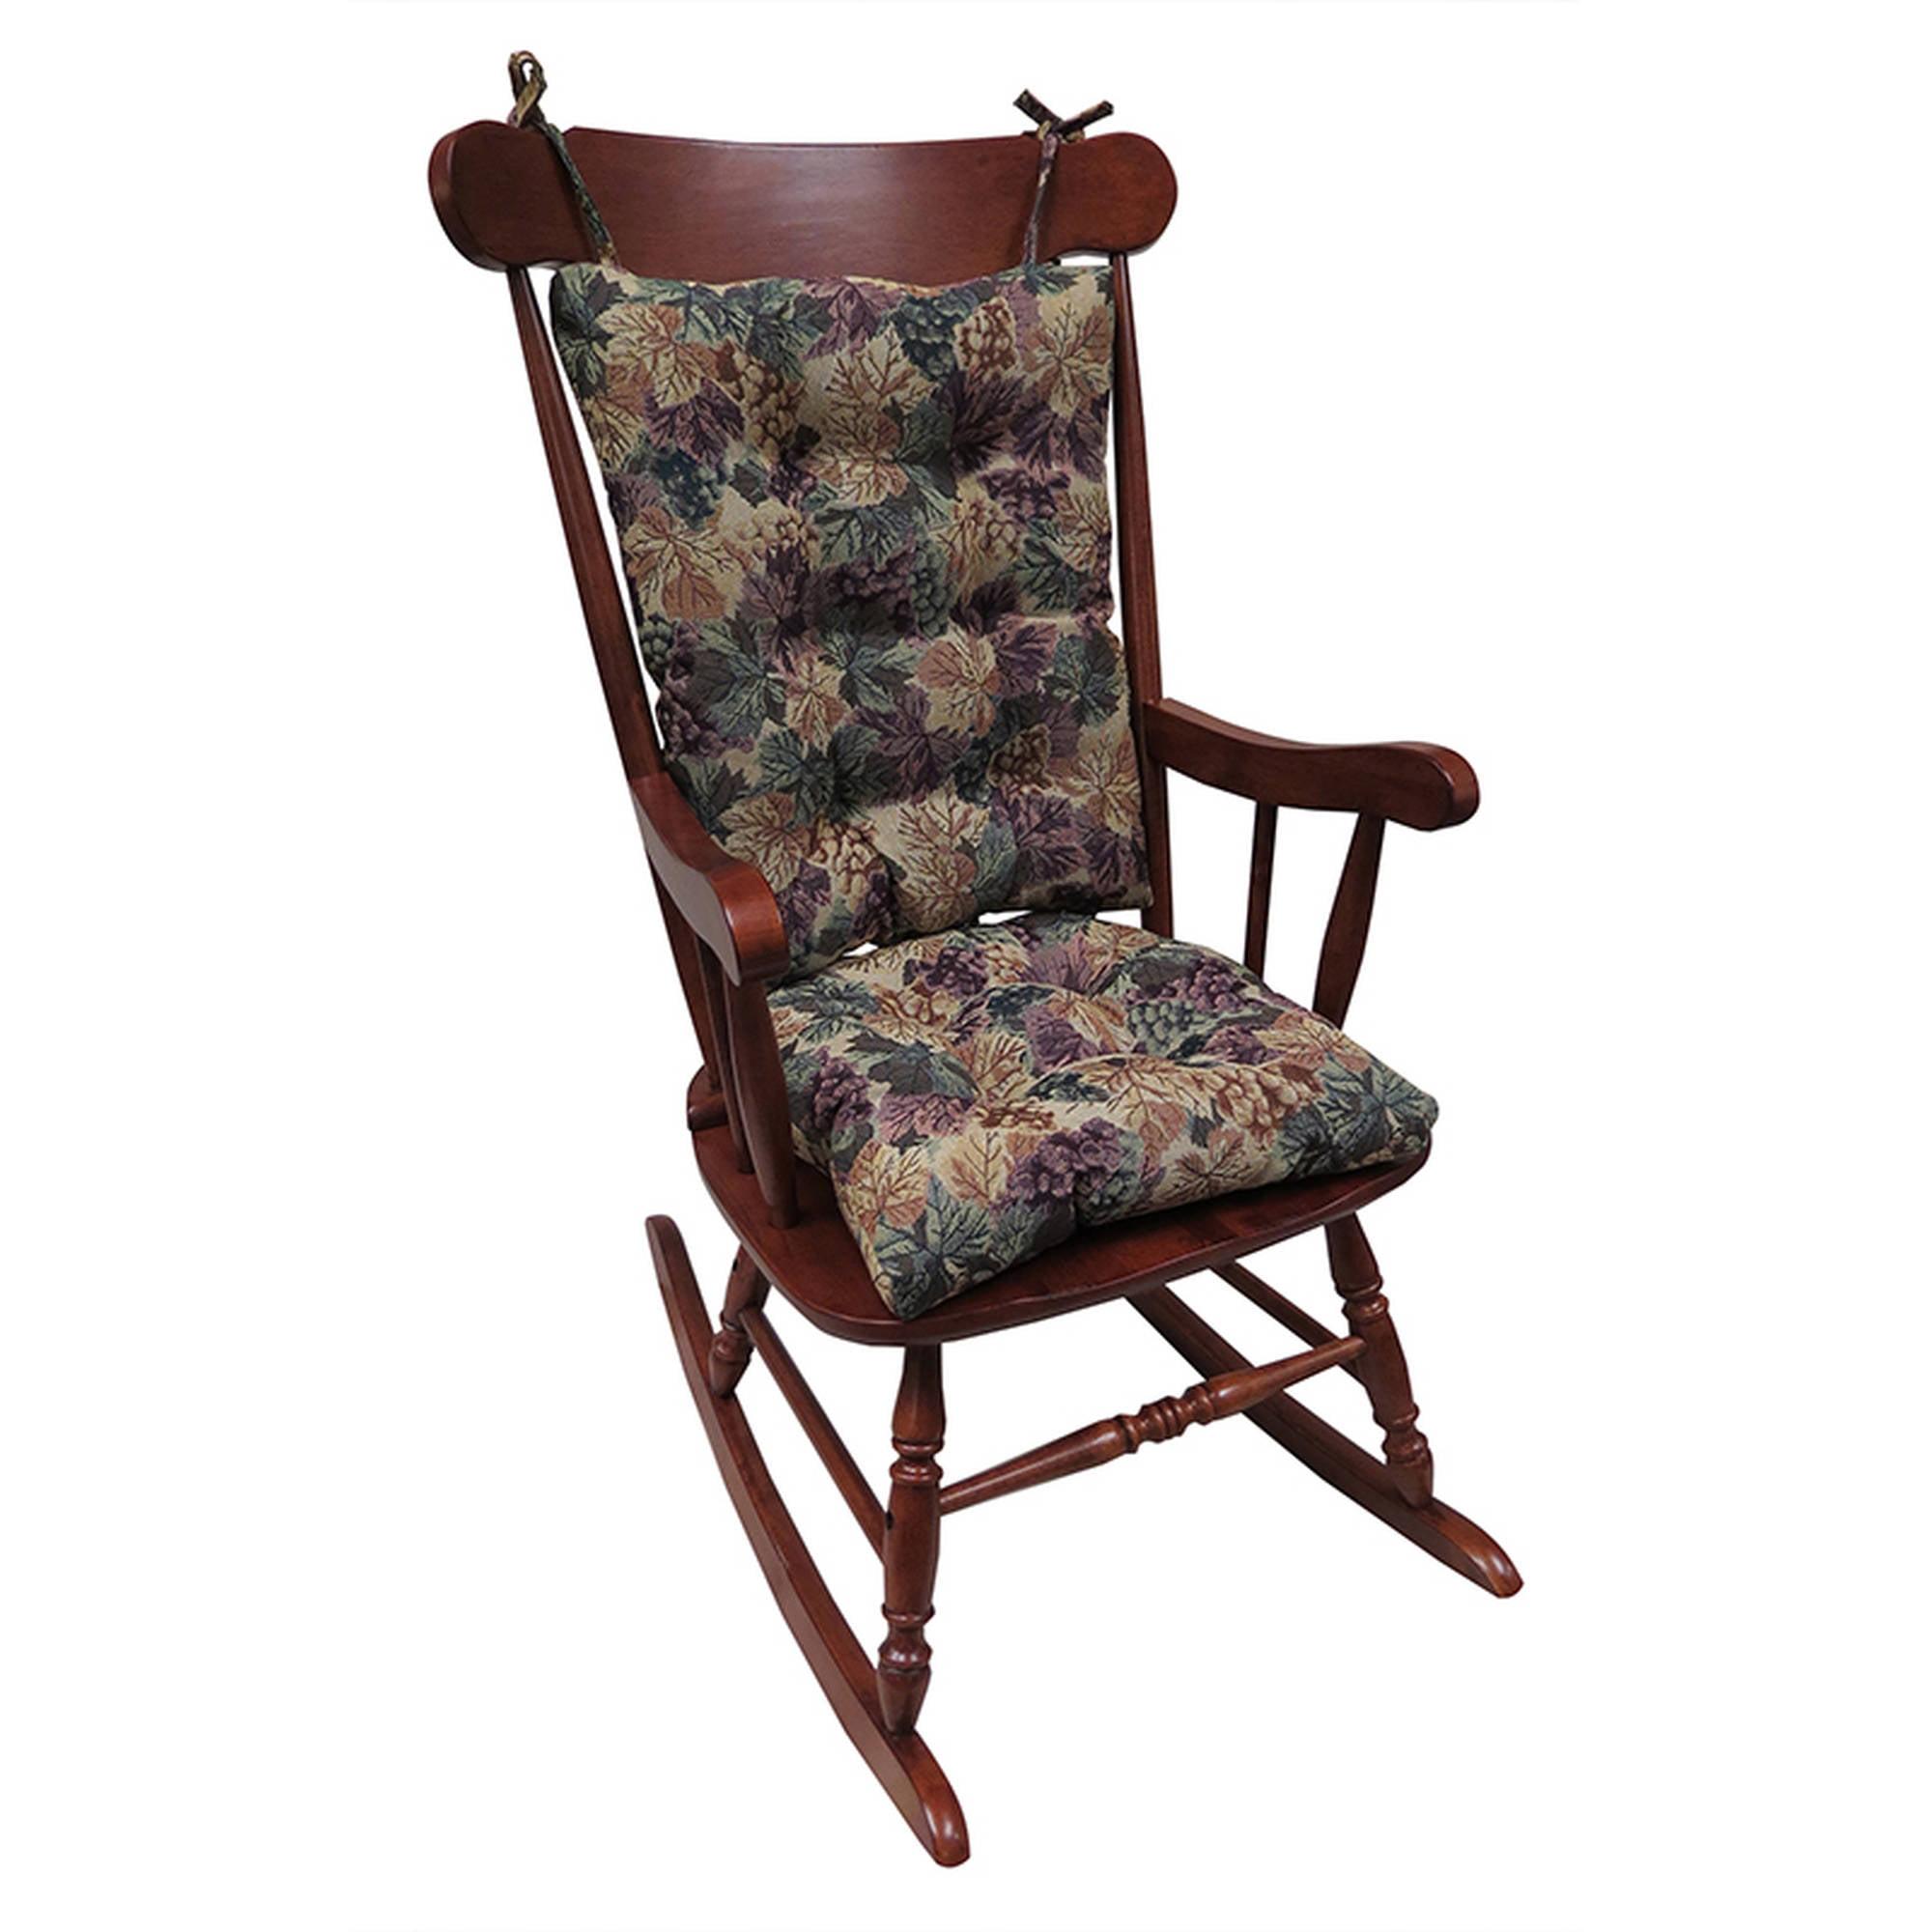 Gripper Jumbo Rocking Chair Cushions, Cabernet